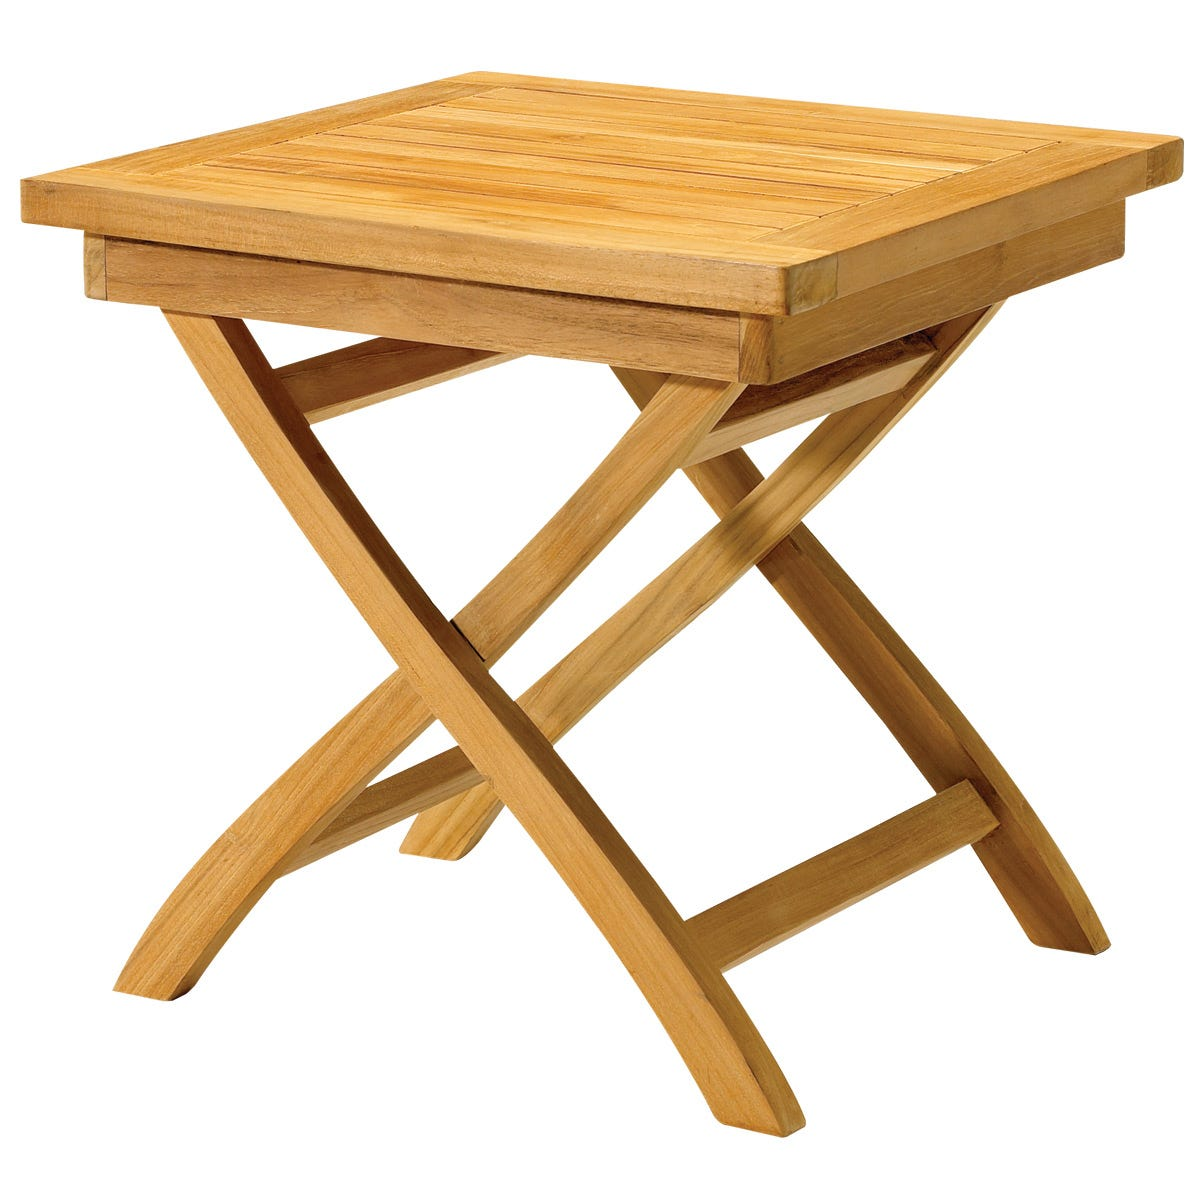 Outdoor teak folding side table from sportys preferred for Teak side table outdoor